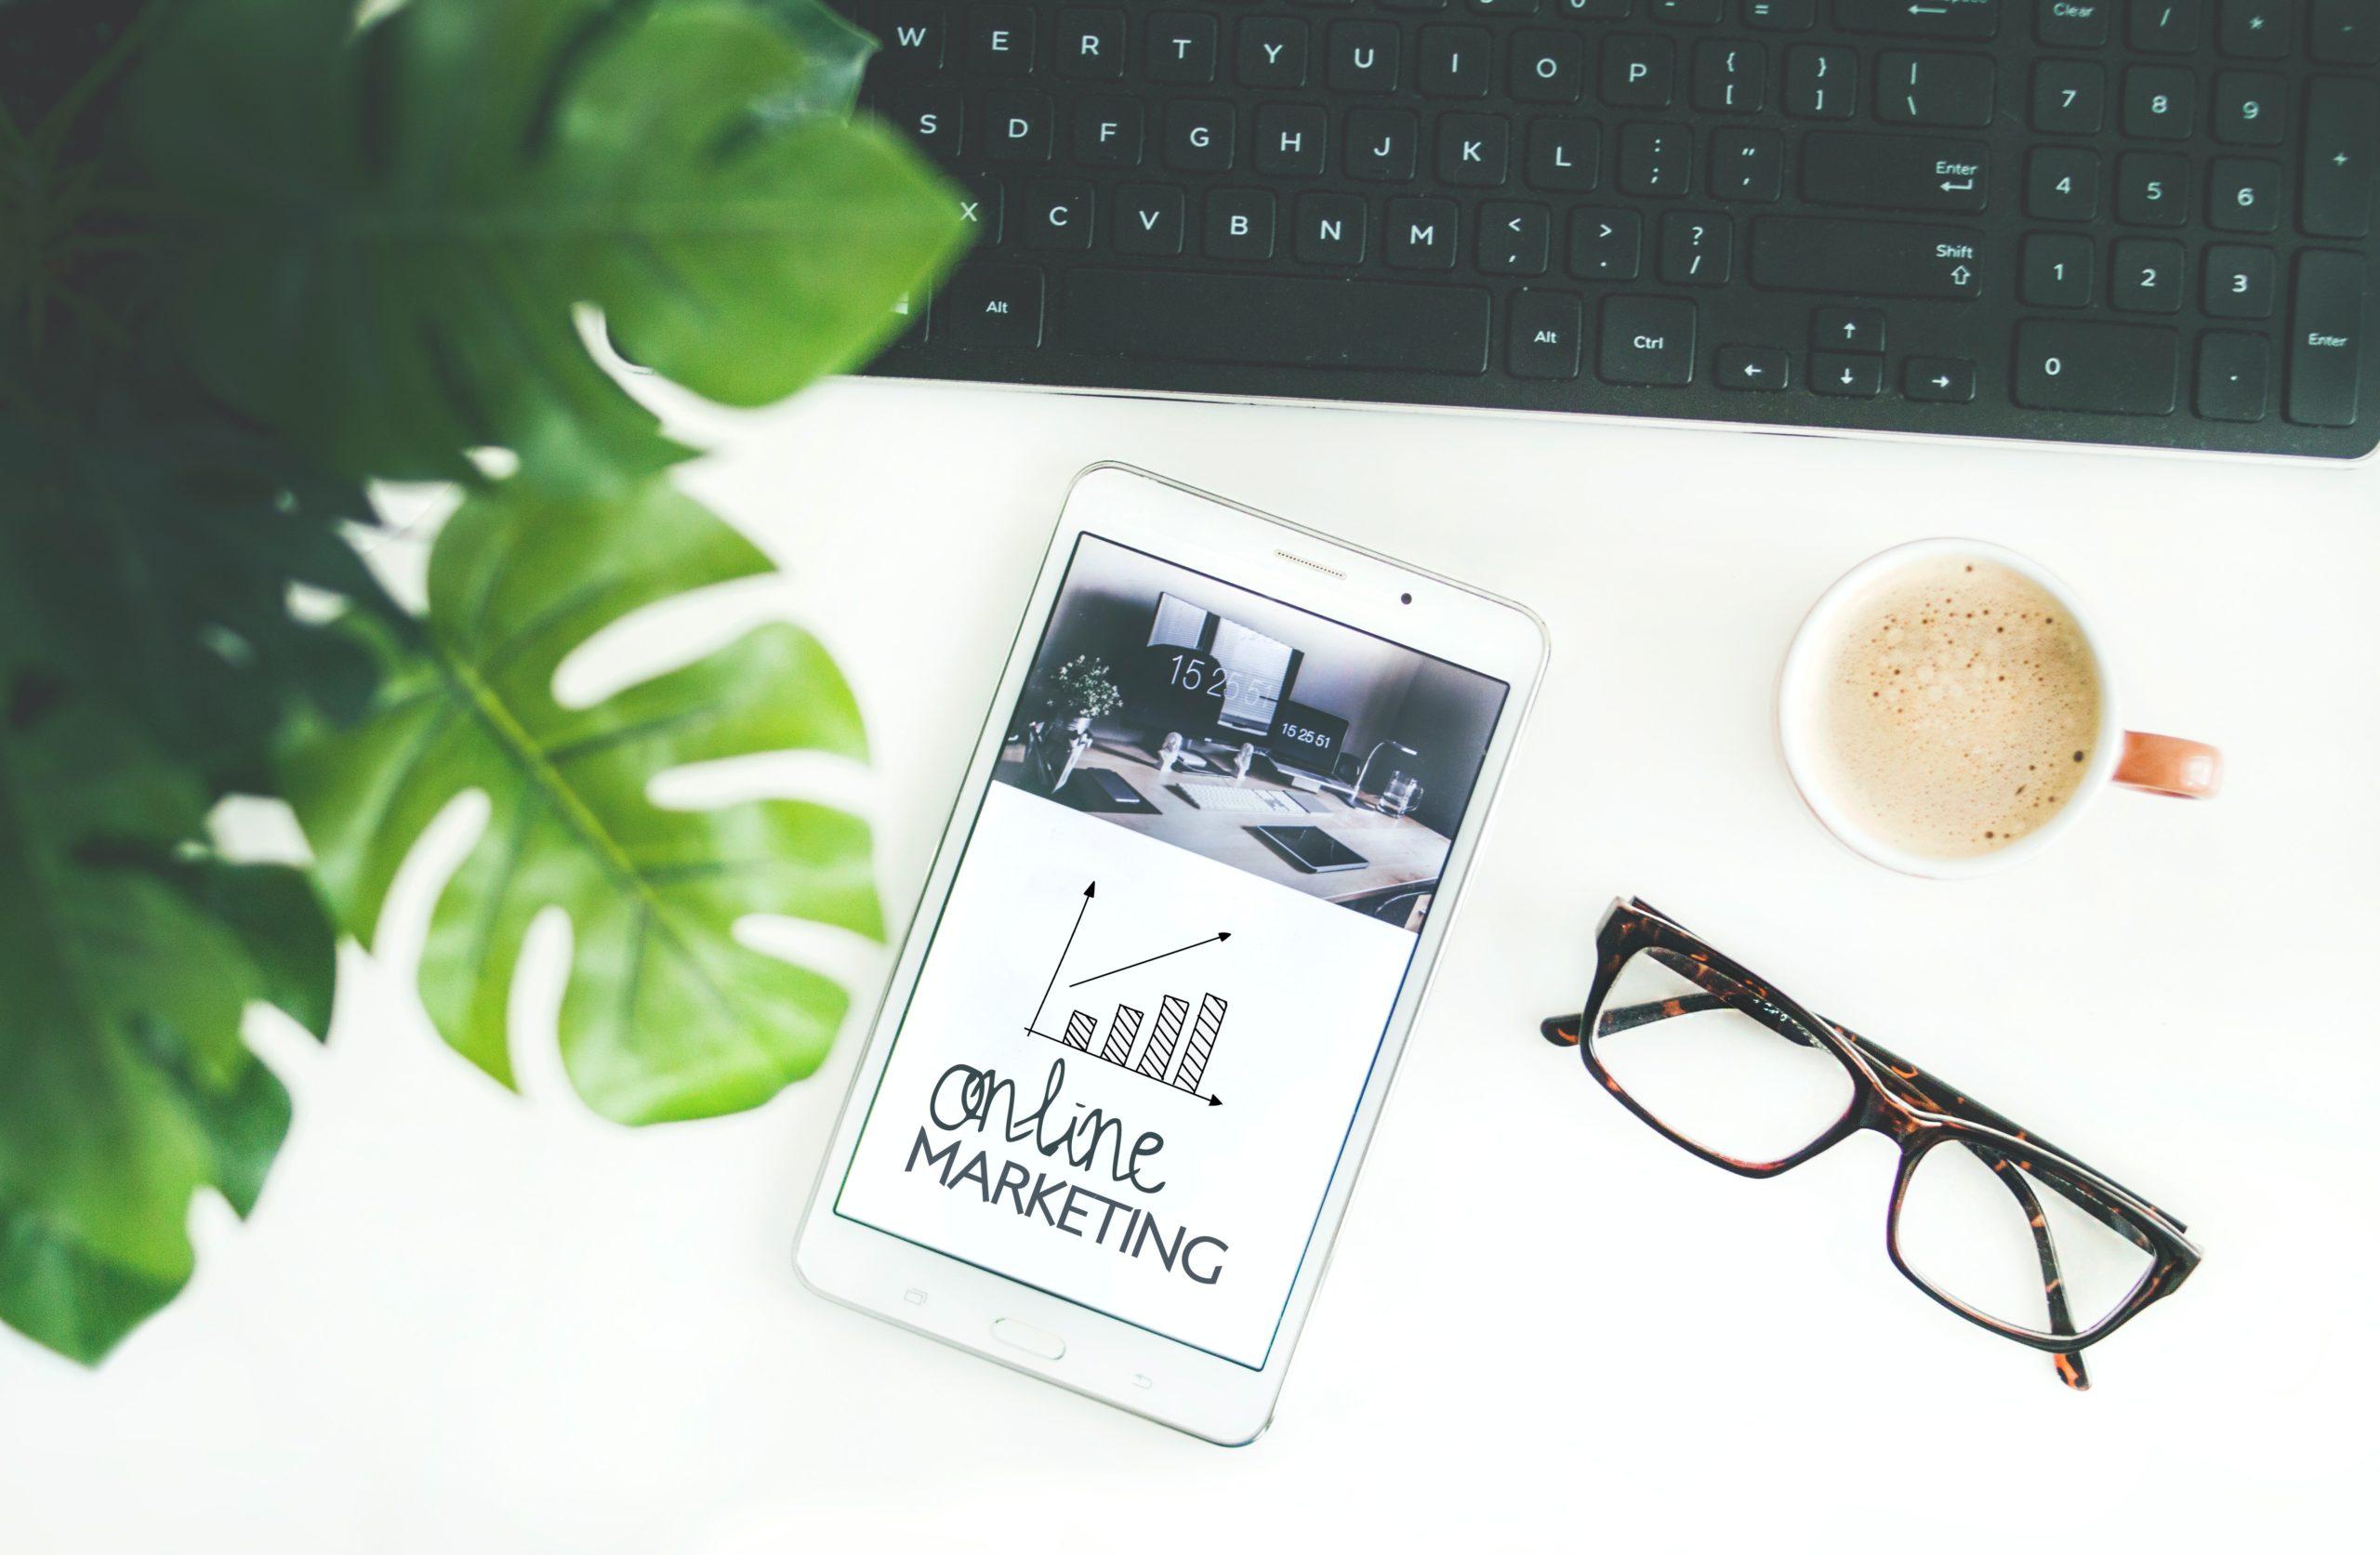 ipad displaying online marketing chart